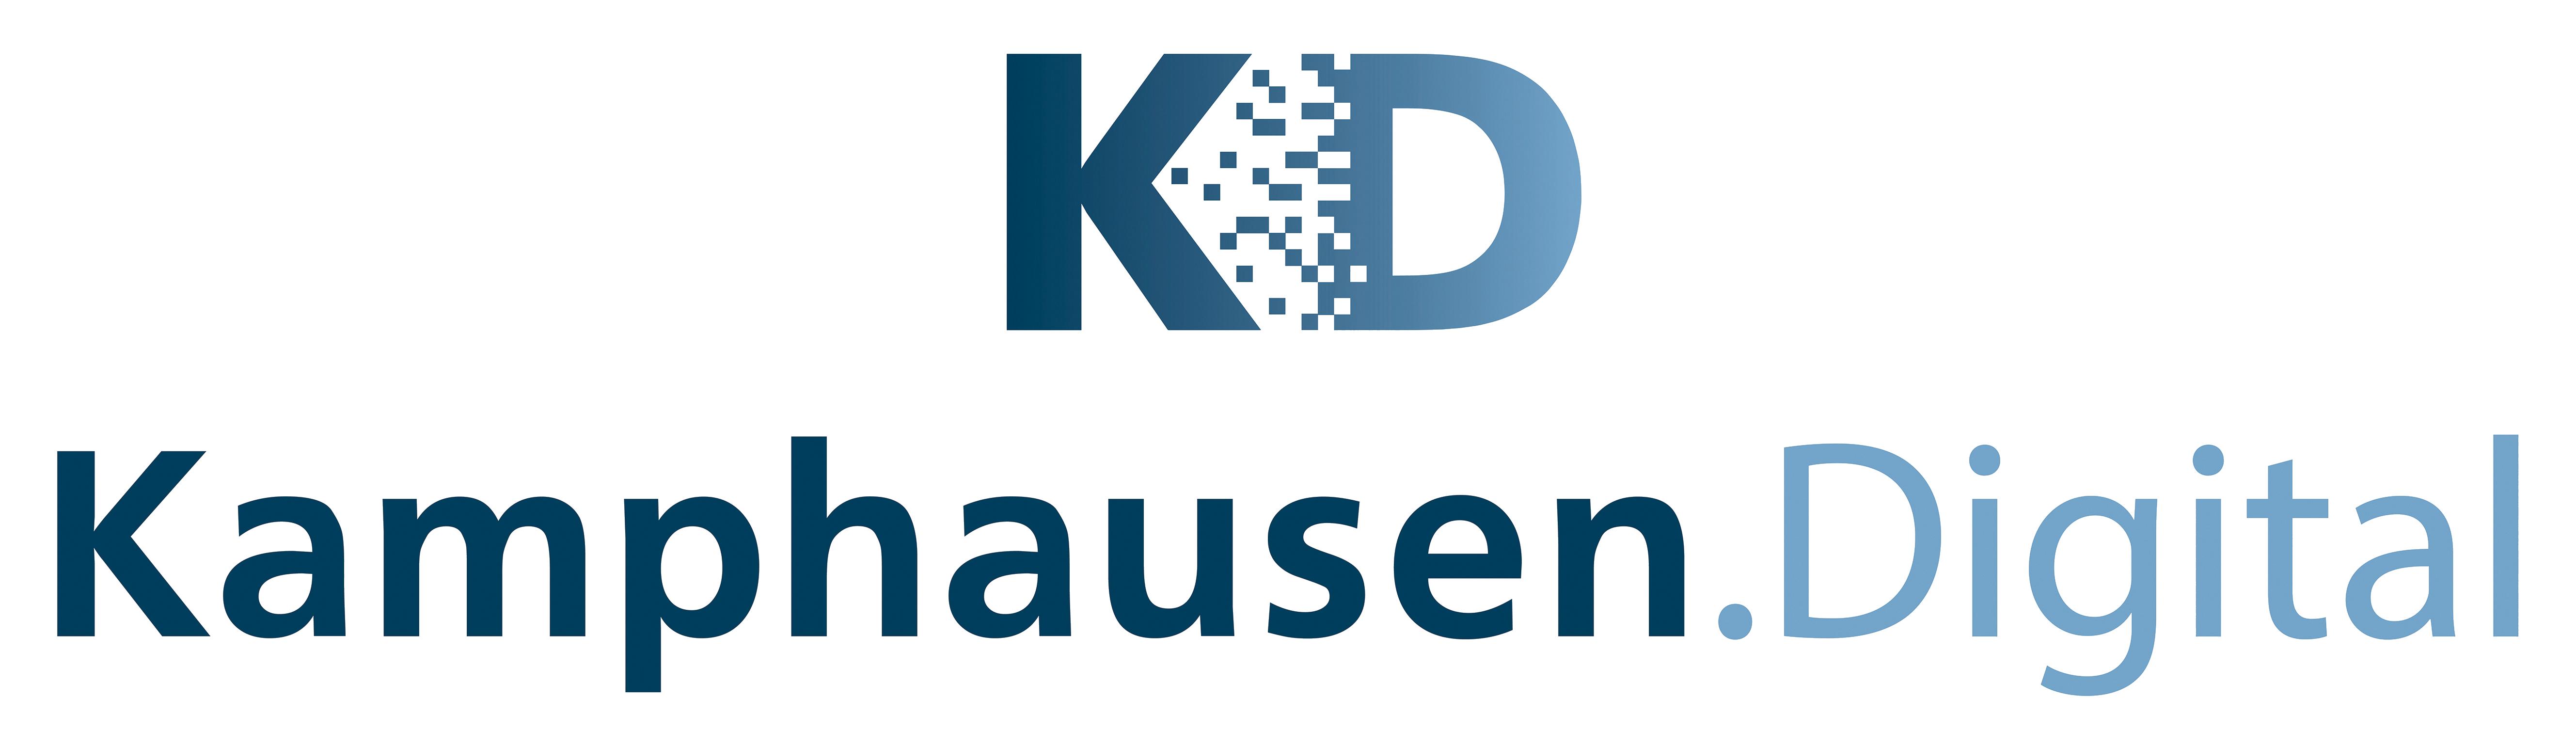 Logo_KamphauseDigital_transparentNEU.png